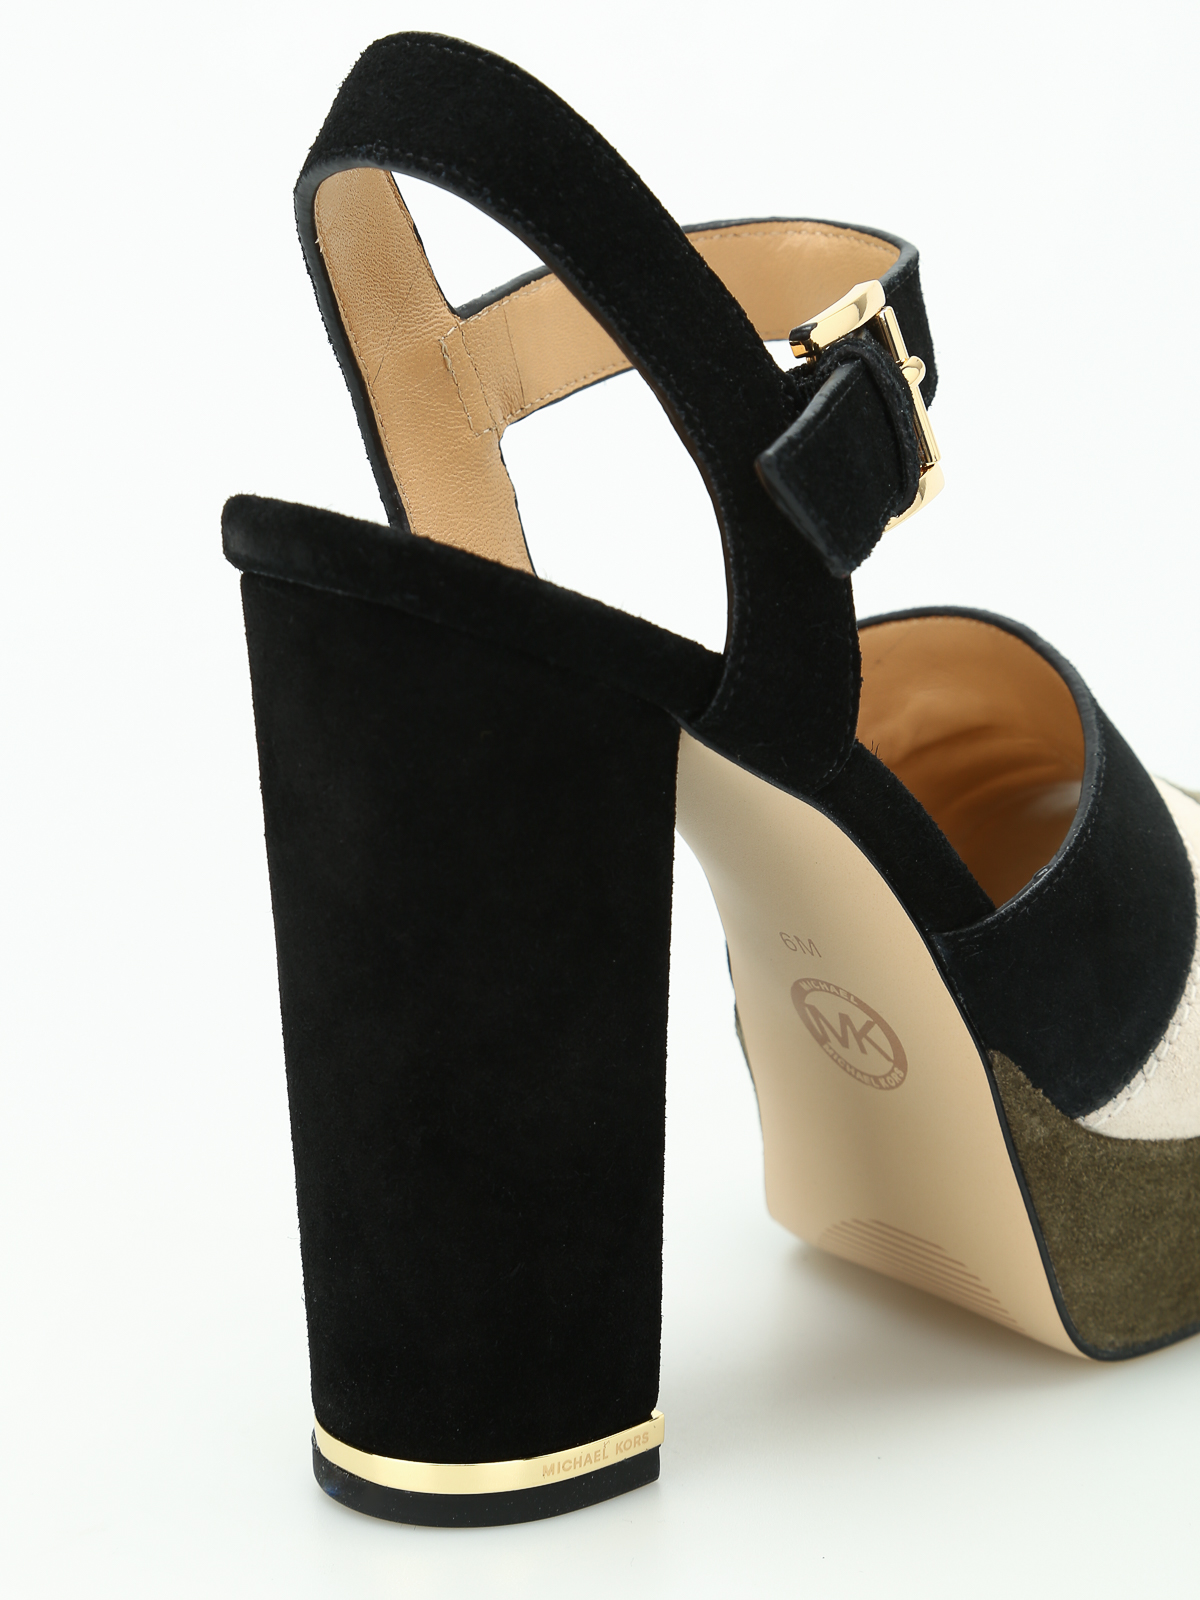 Anise Clothing Online Shopping